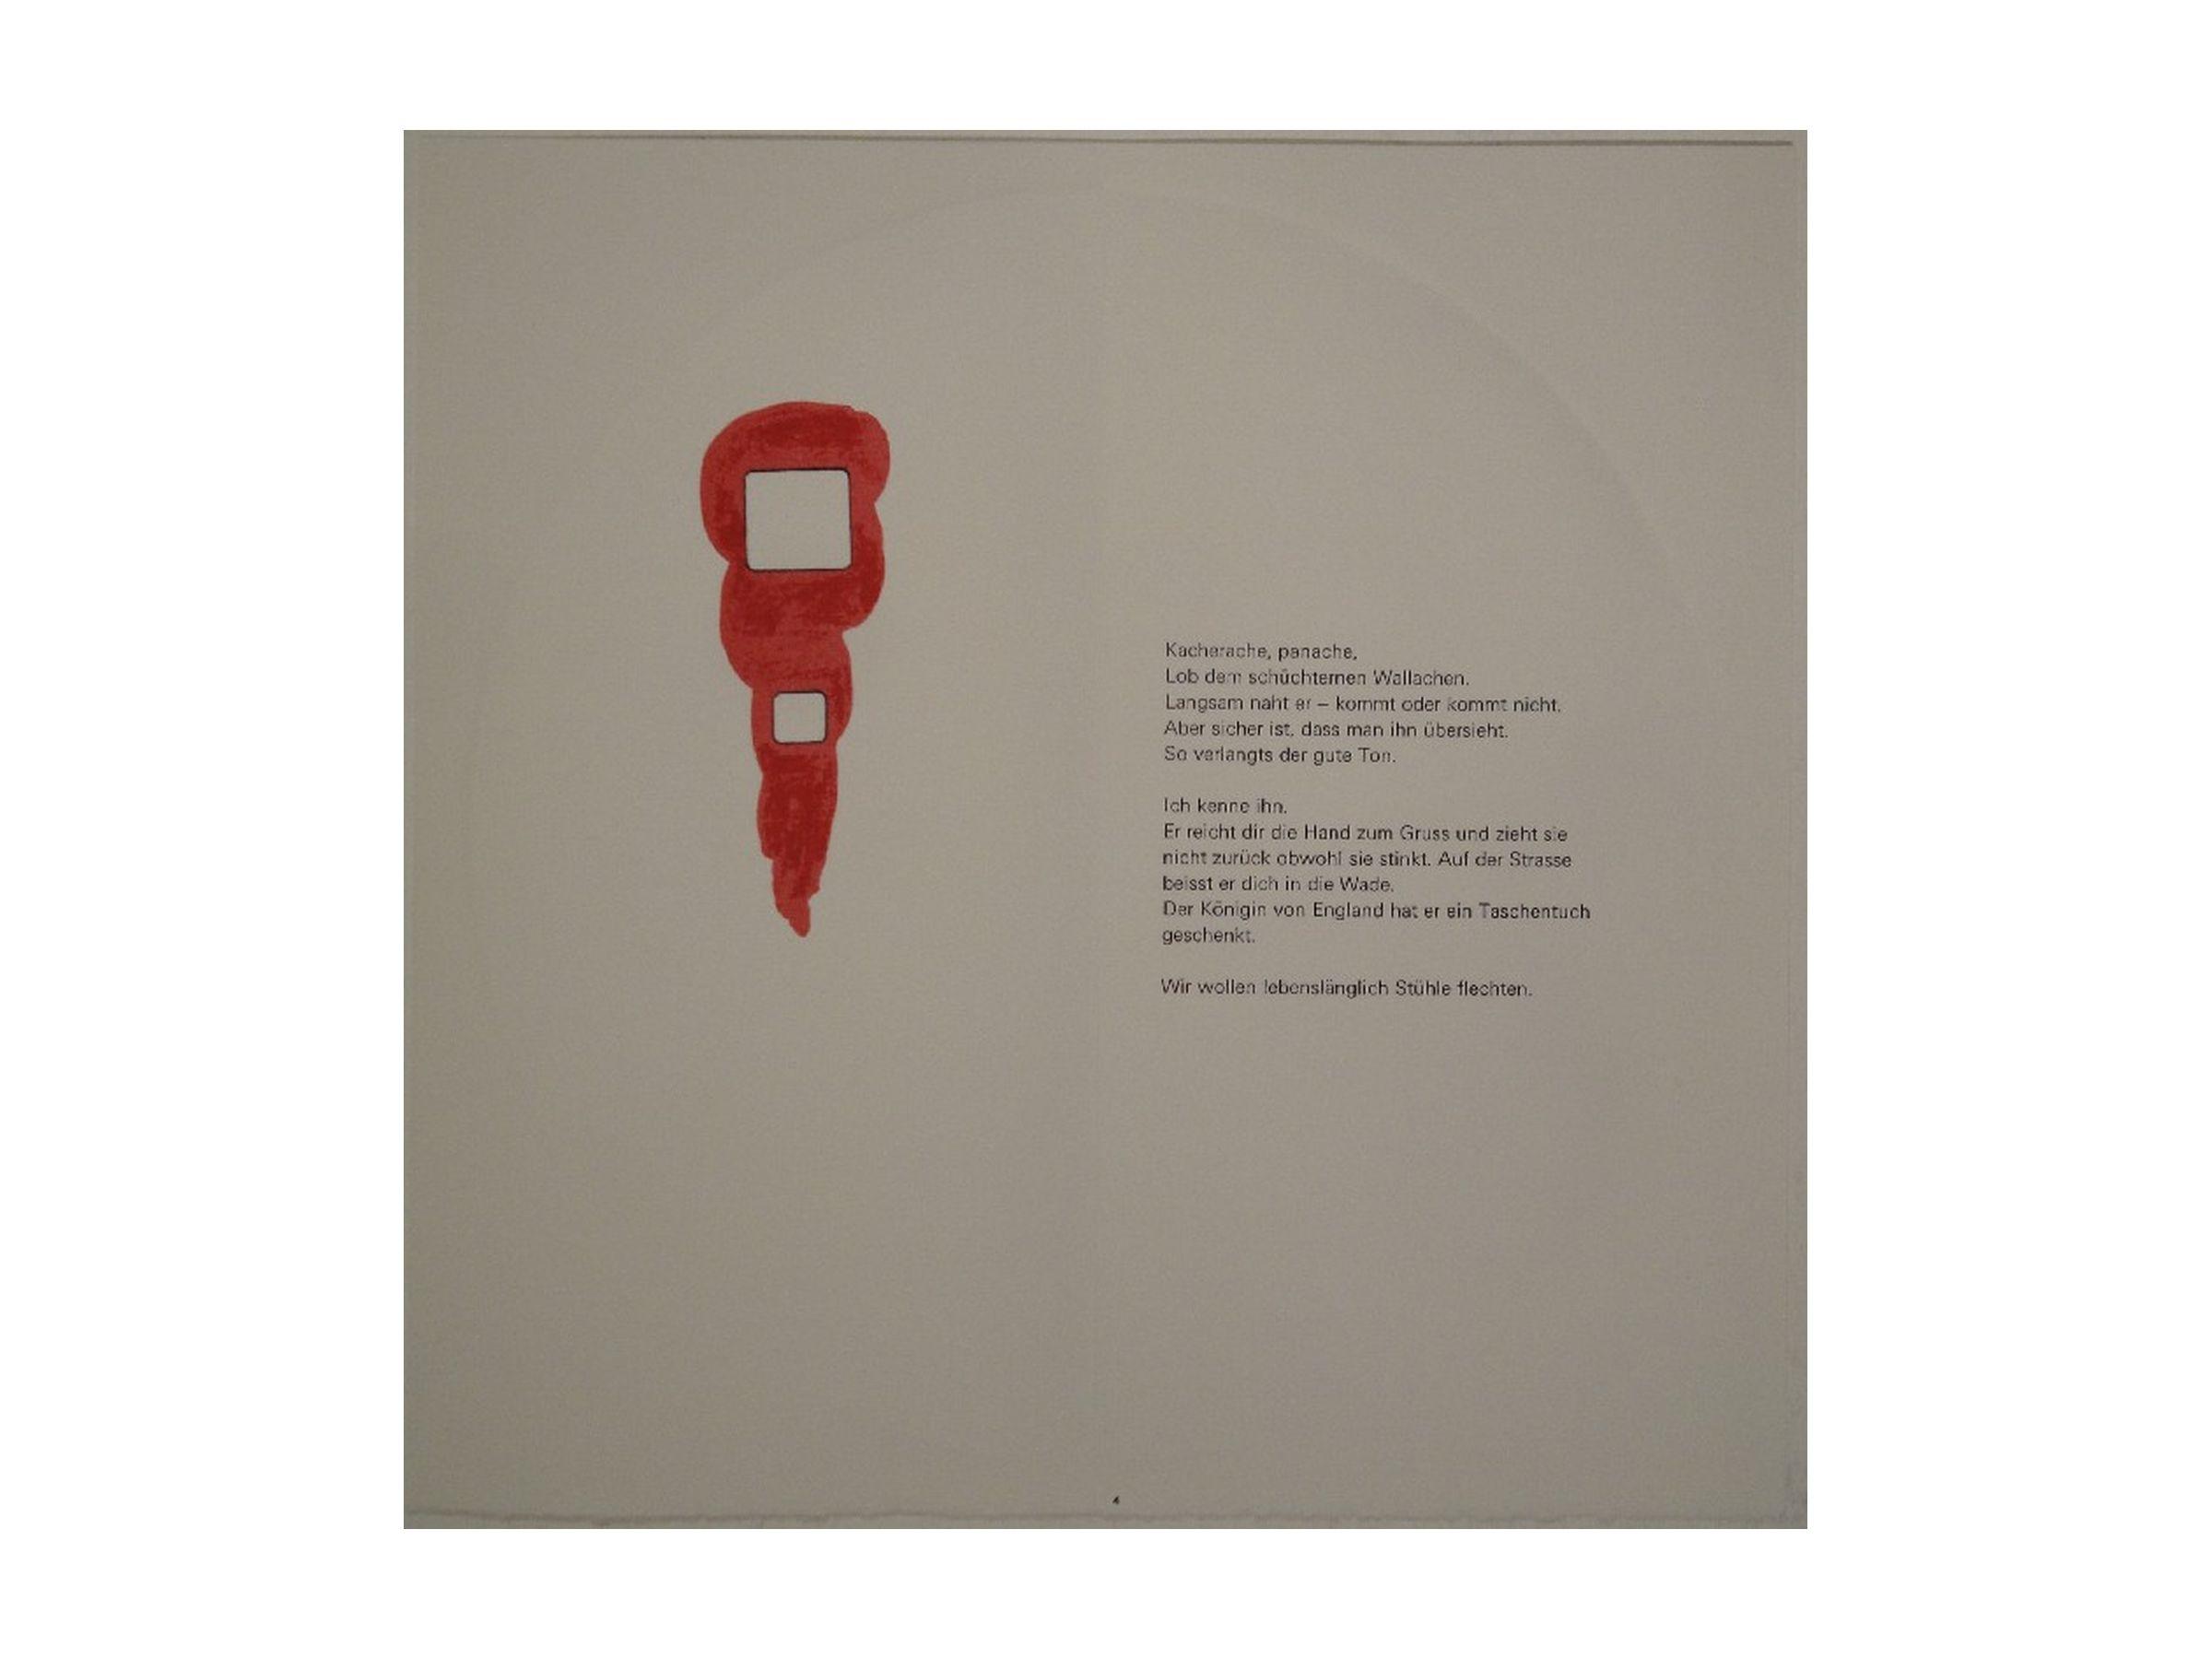 Oppenheim-Sansibar-carrousel-2